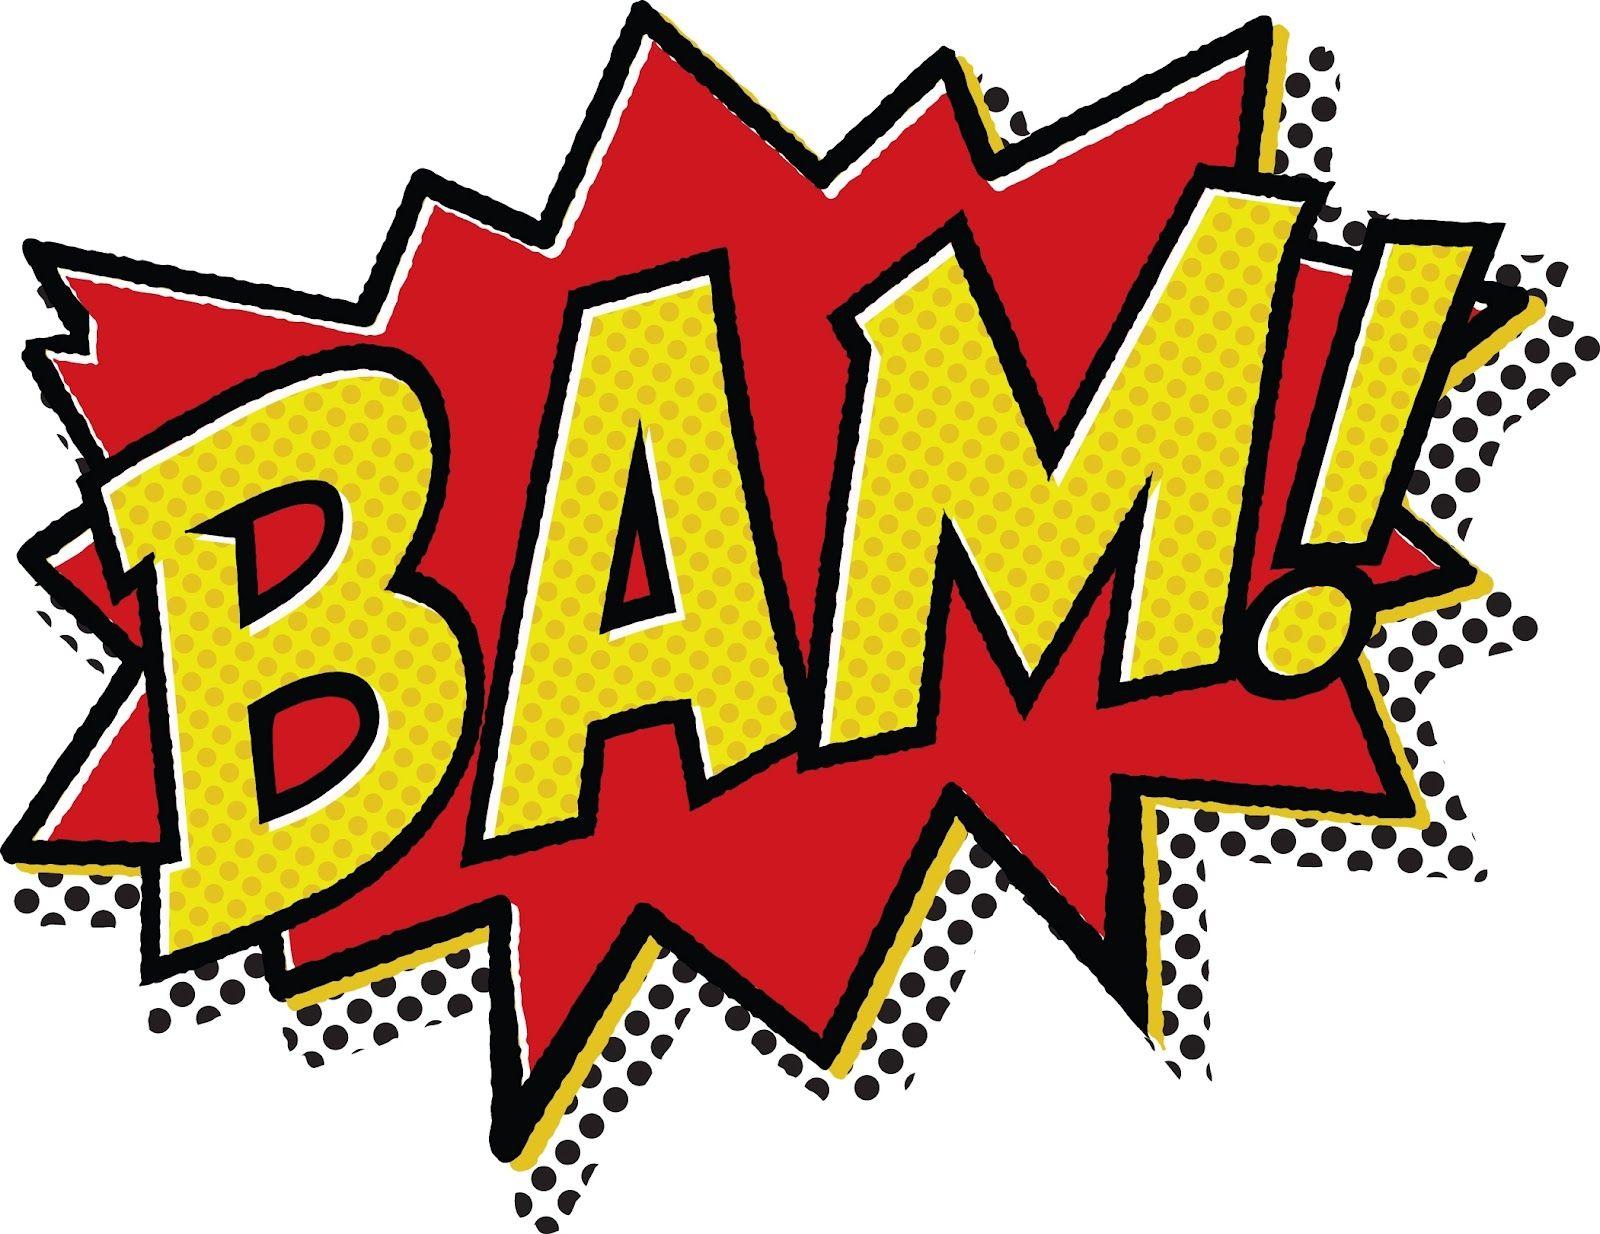 Bam picture super hero. Boom clipart comic strip